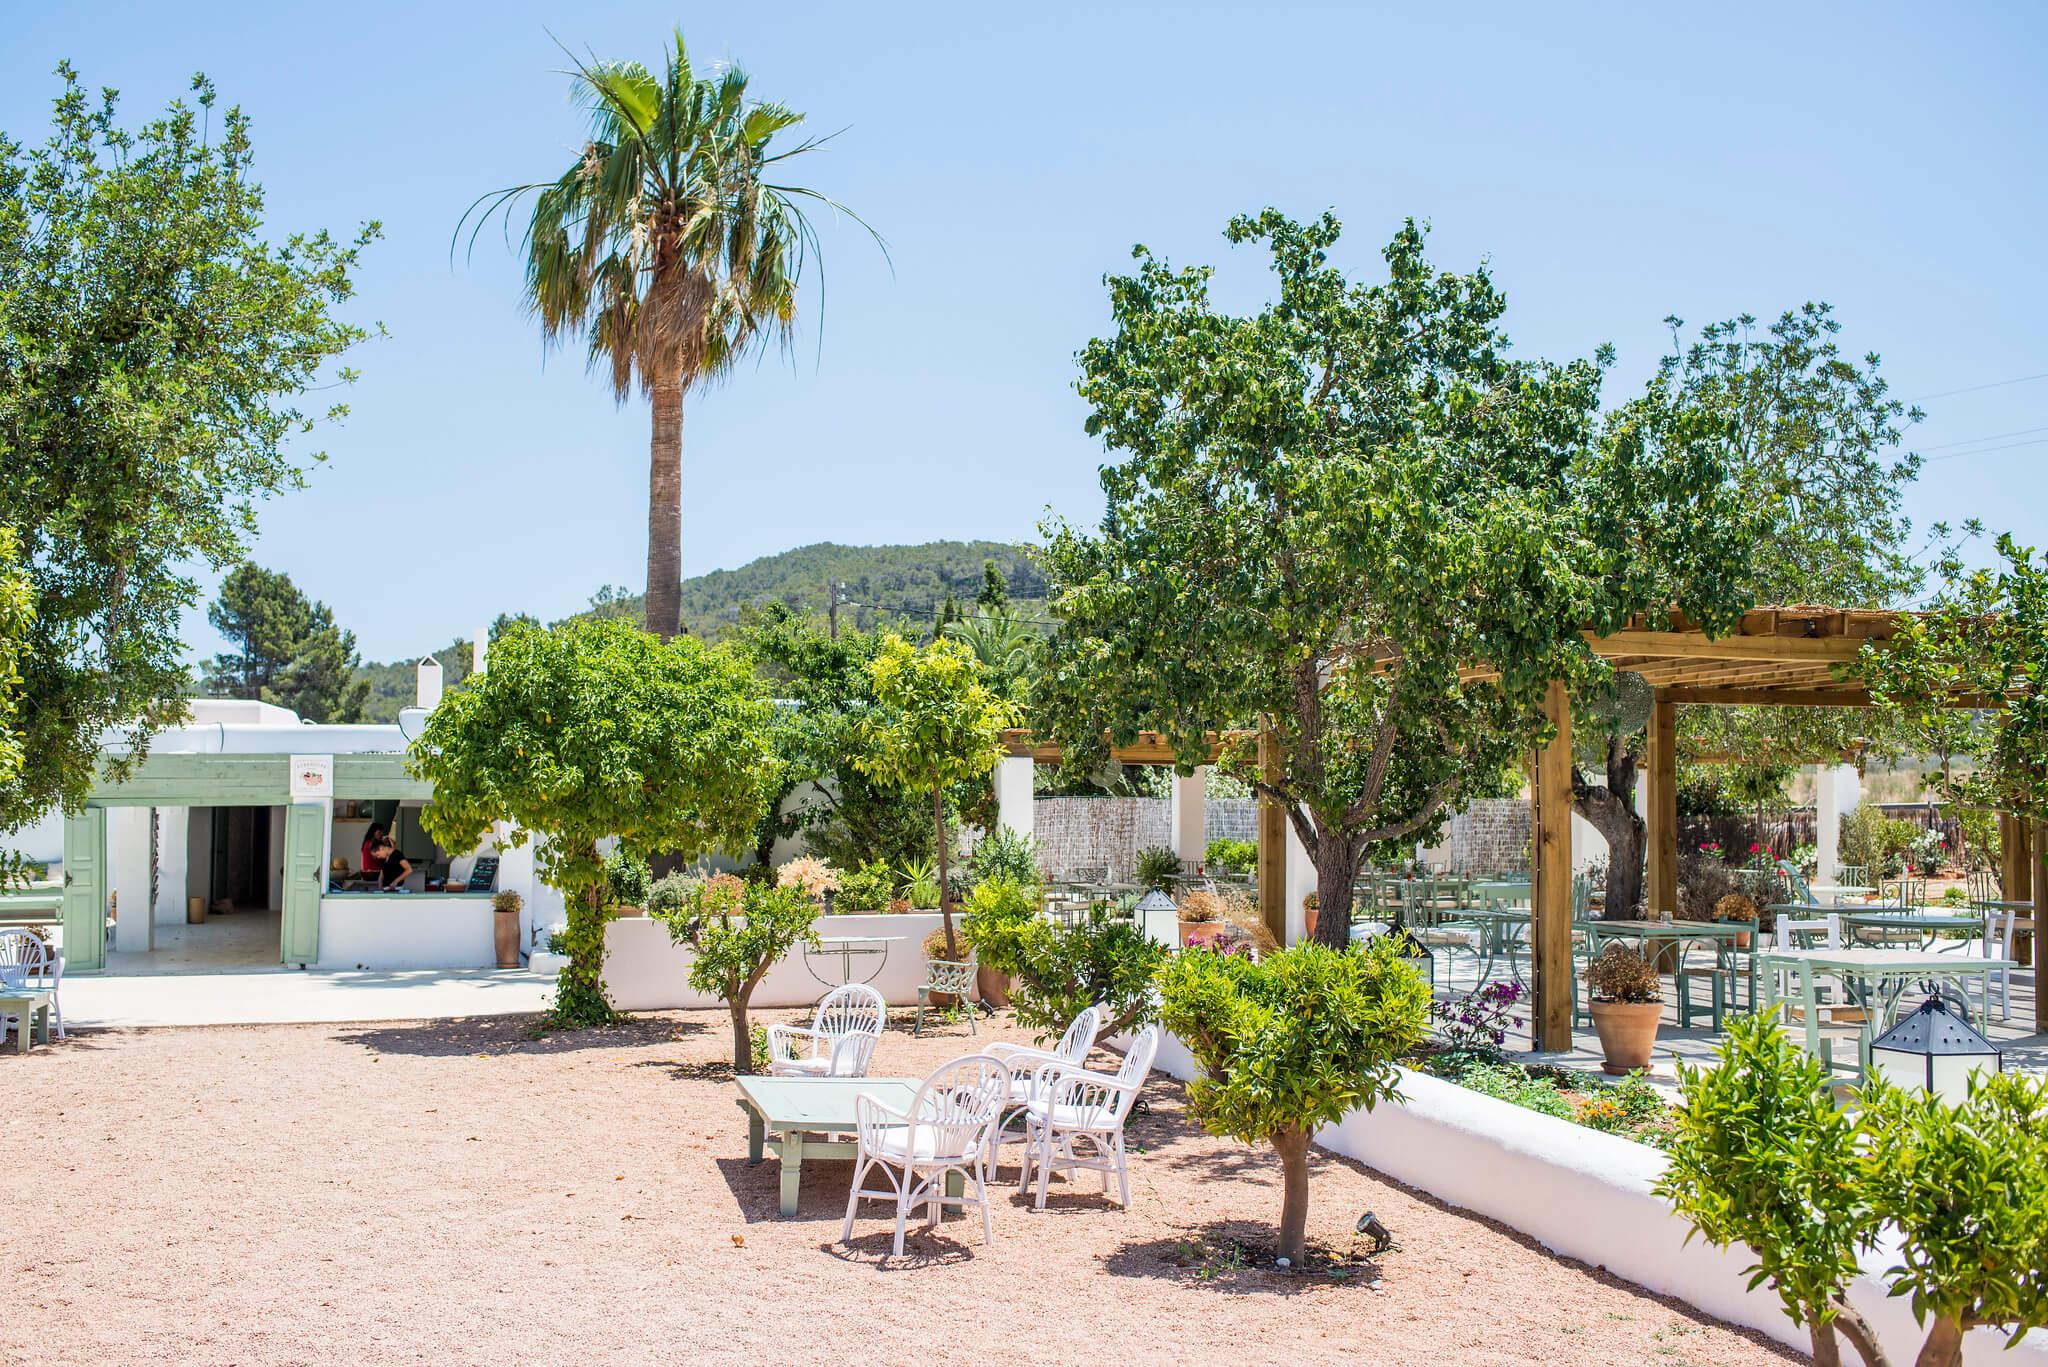 https://www.white-ibiza.com/wp-content/uploads/2020/05/white-ibiza-villas-where-to-stay-santa-gertrudis-03.jpg